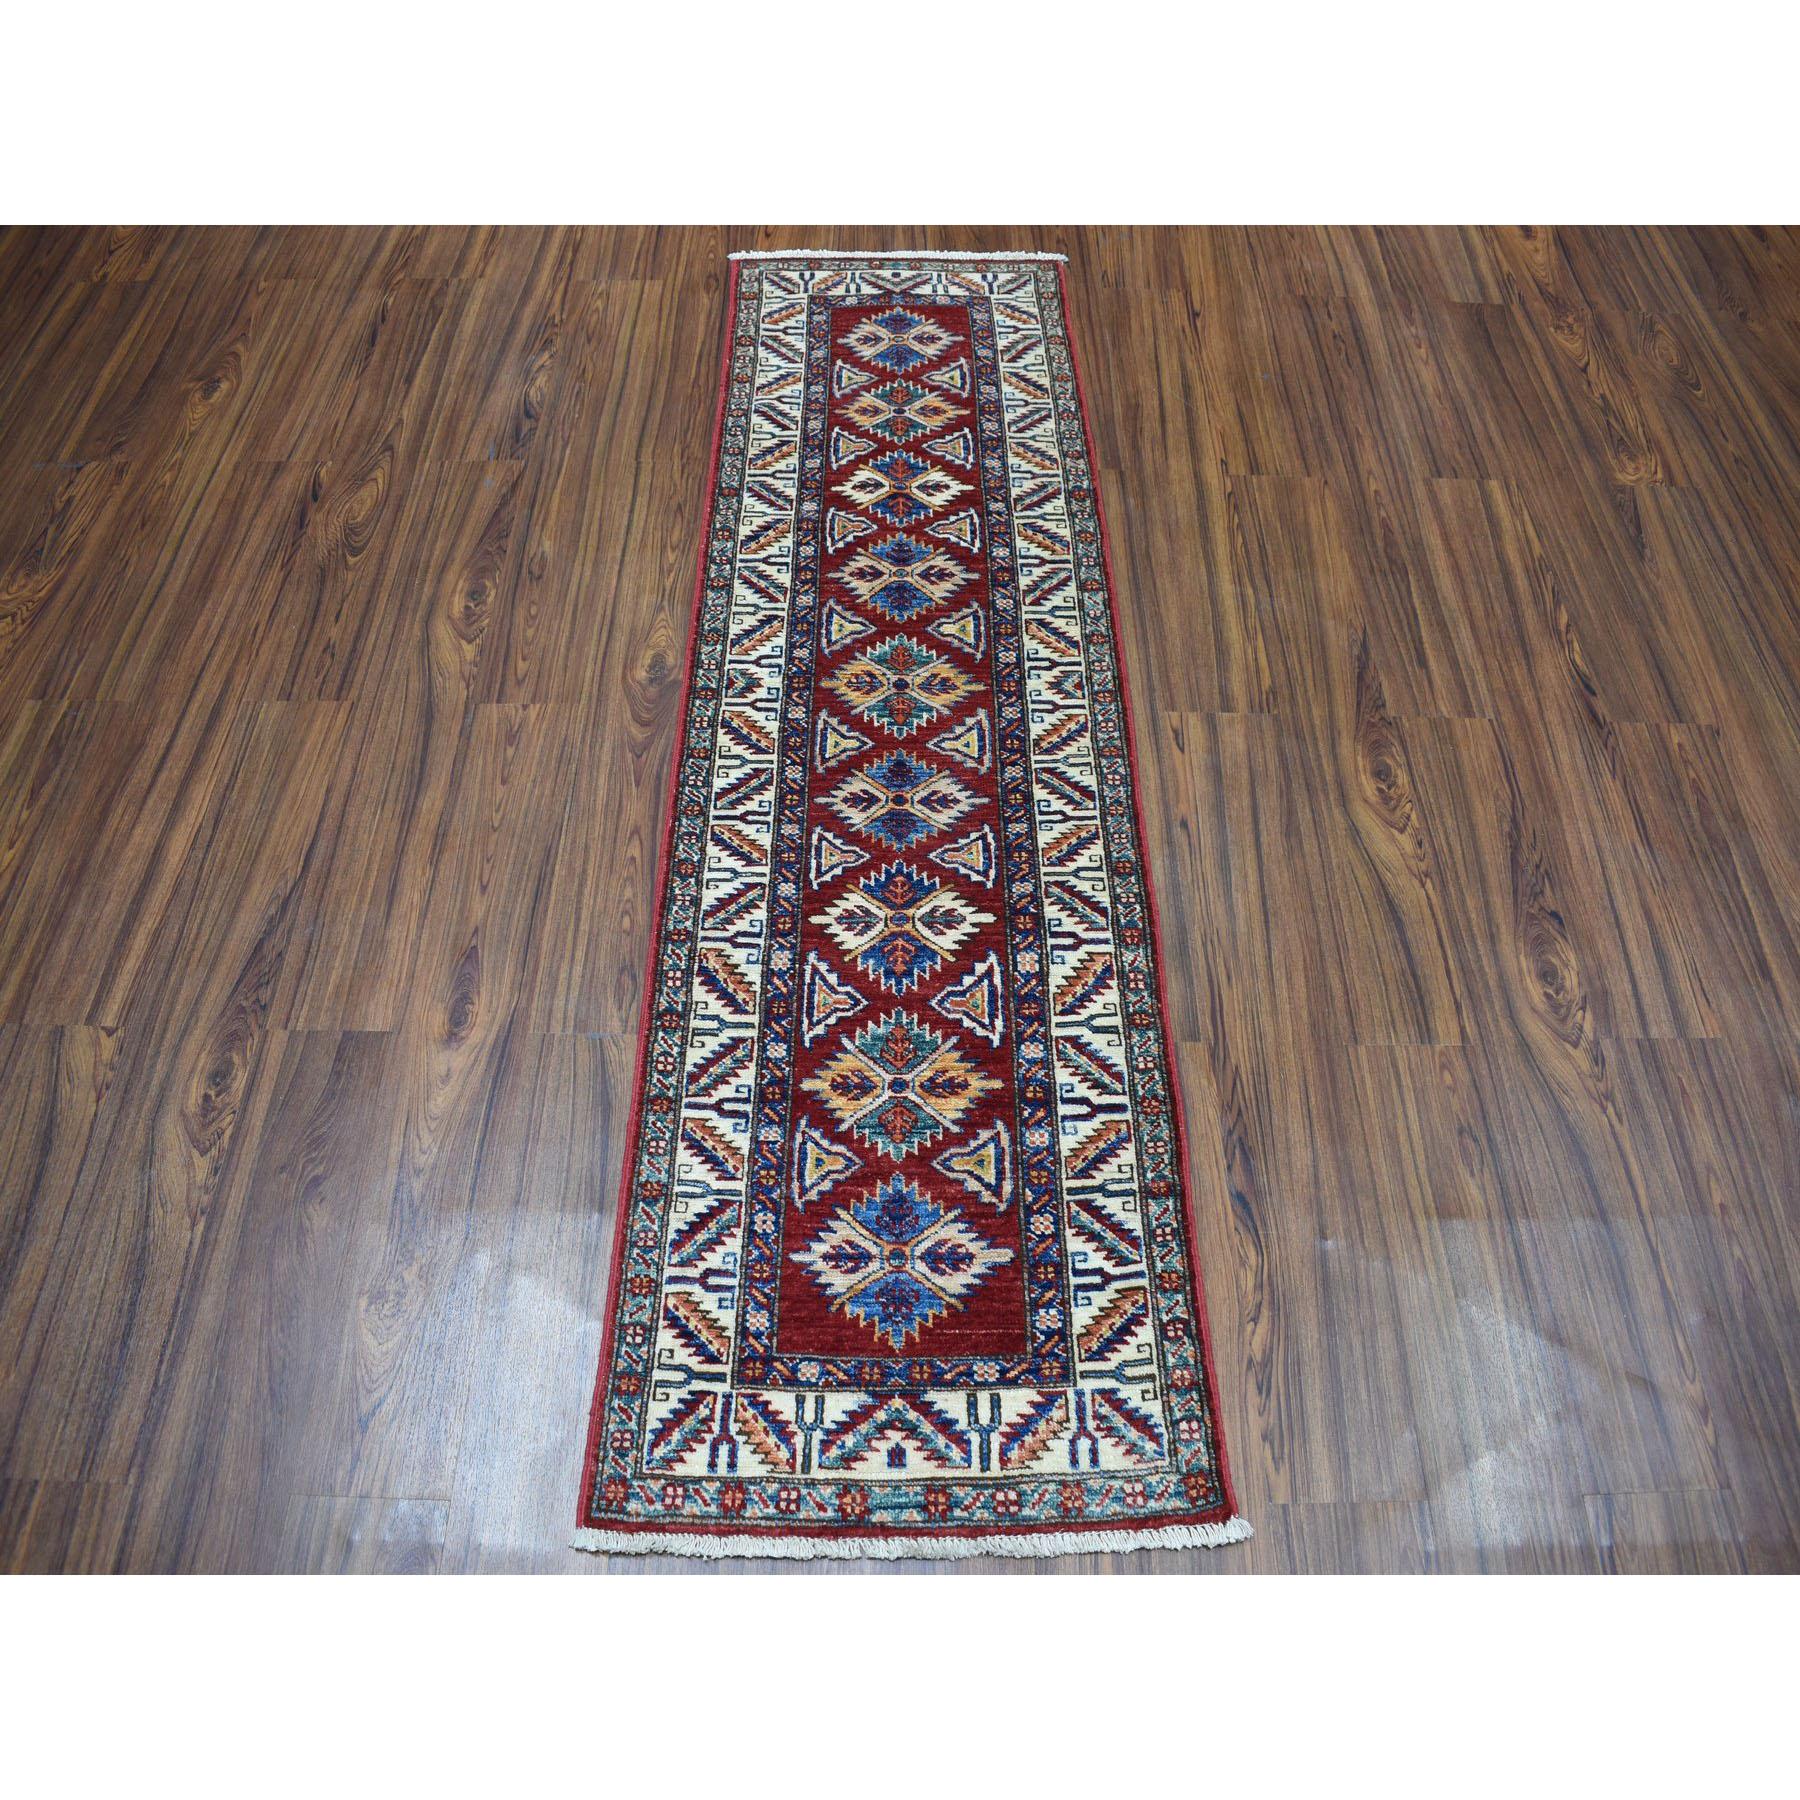 2-x6-3  Red Super Kazak Pure Wool Geometric Design Hand-Knotted Runner Oriental Rug